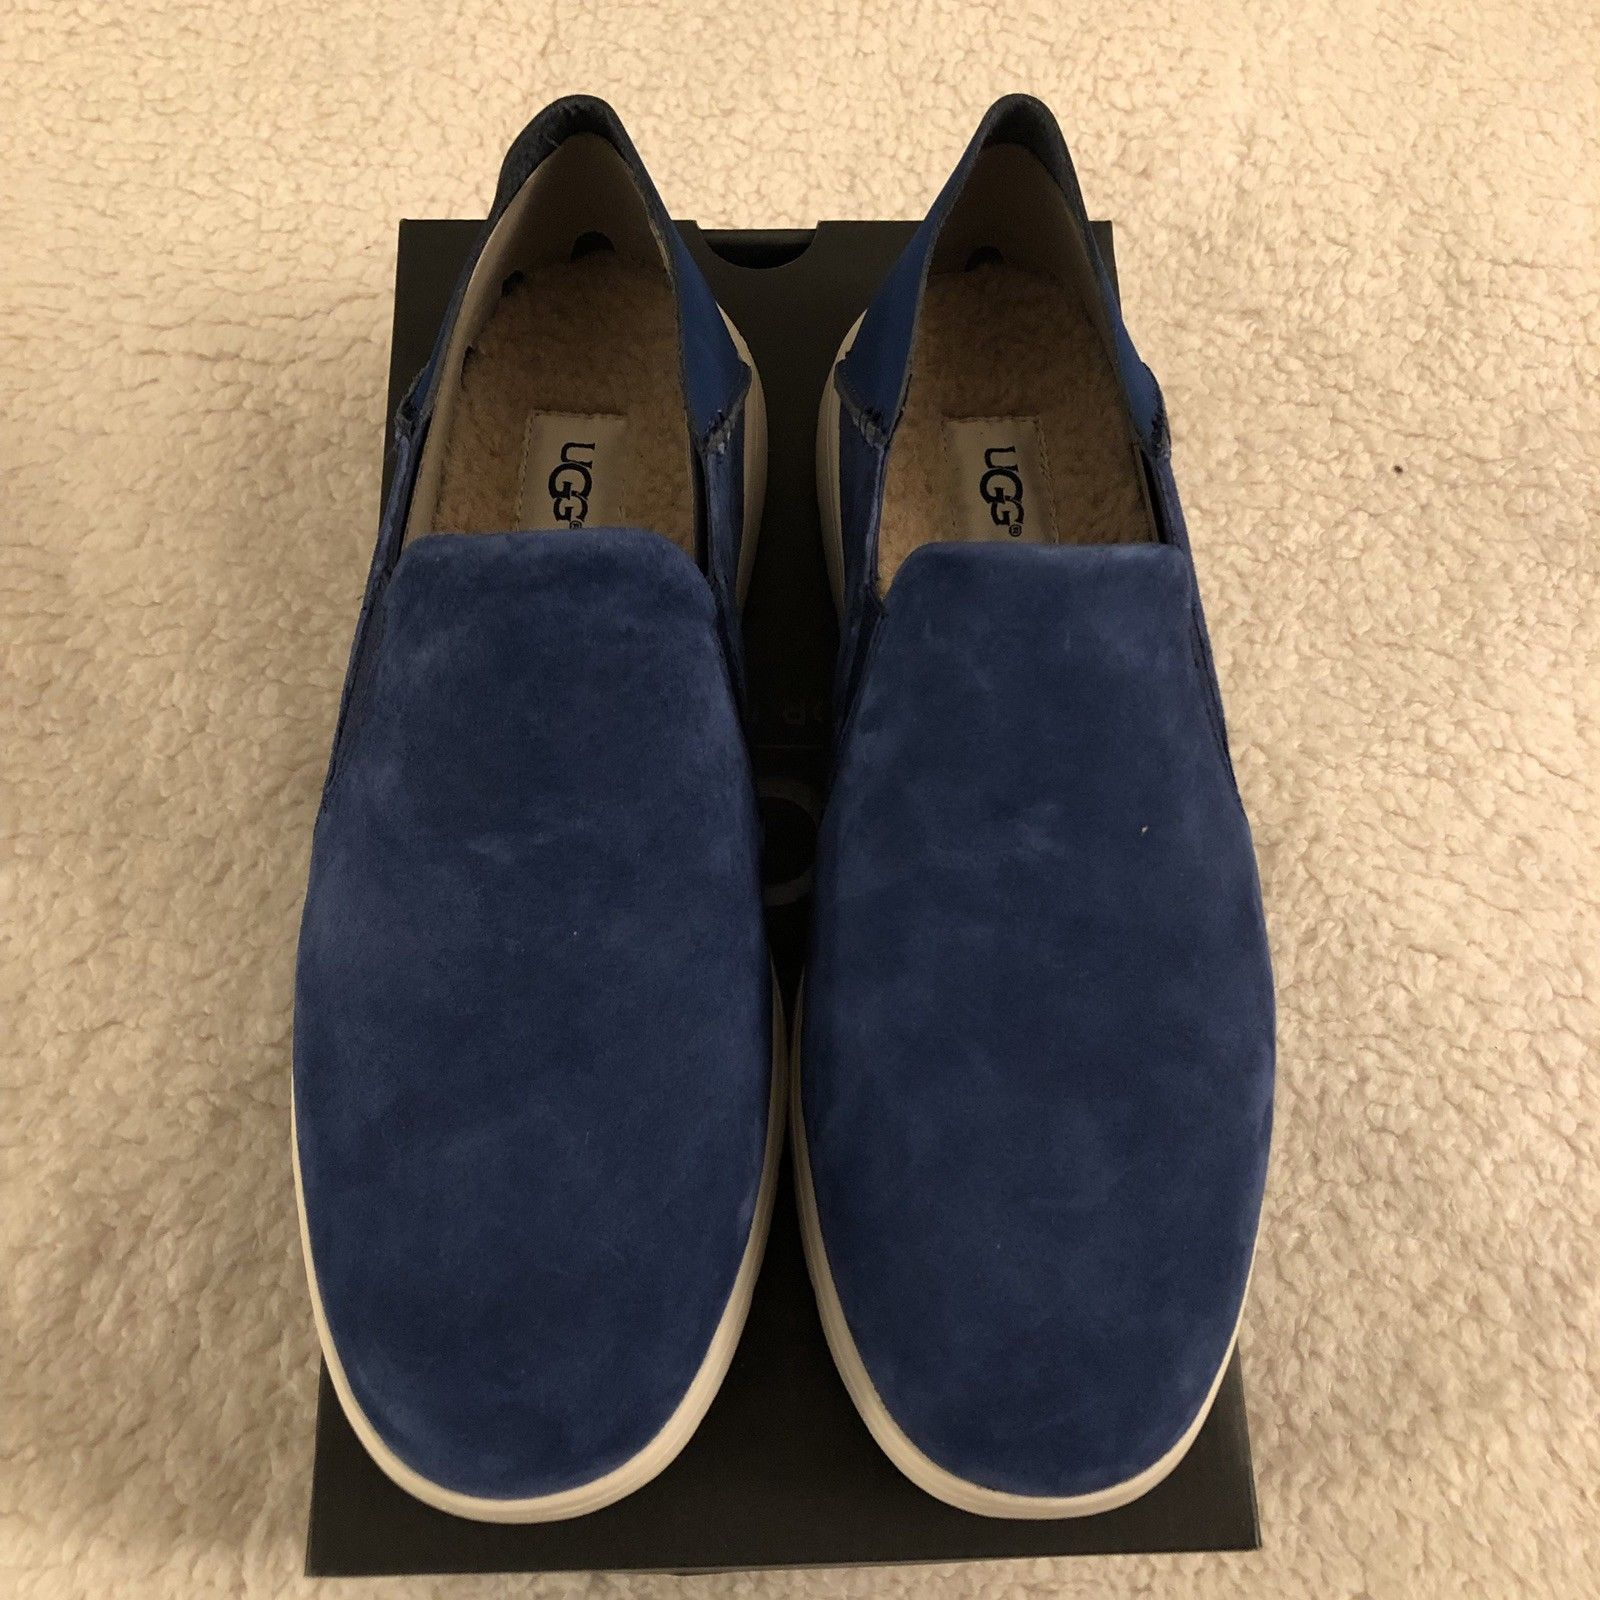 NEW UGG Men's Knox Suede Slip On Sneaker, Sizes 9, 11  Blue, MSRP $100 image 6